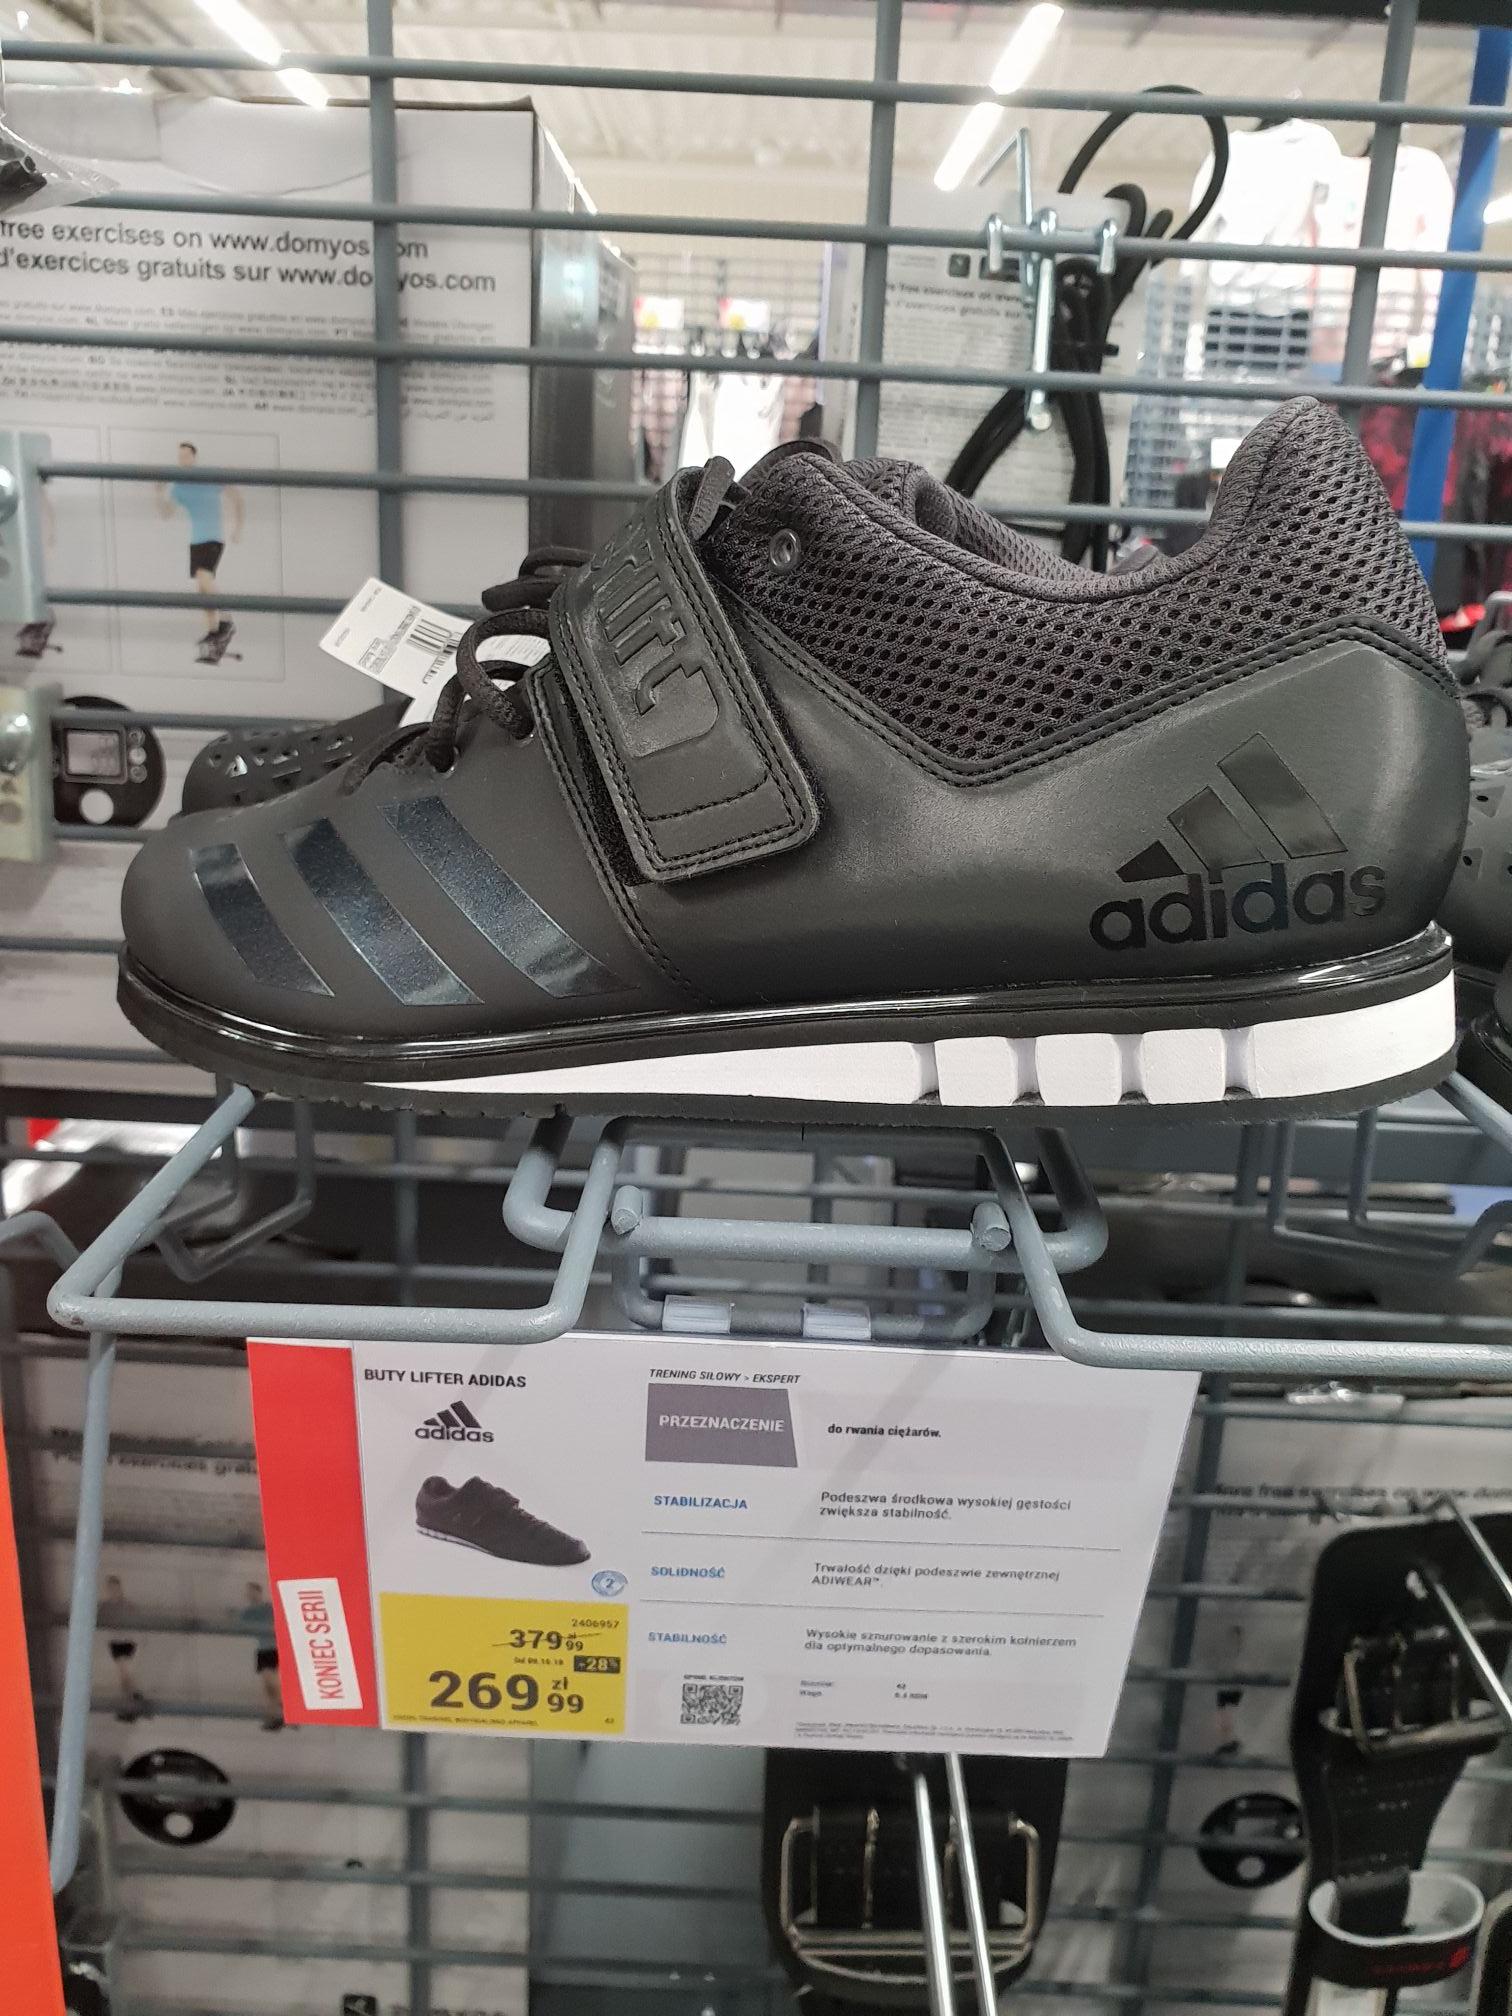 Buty Lifter Adidas